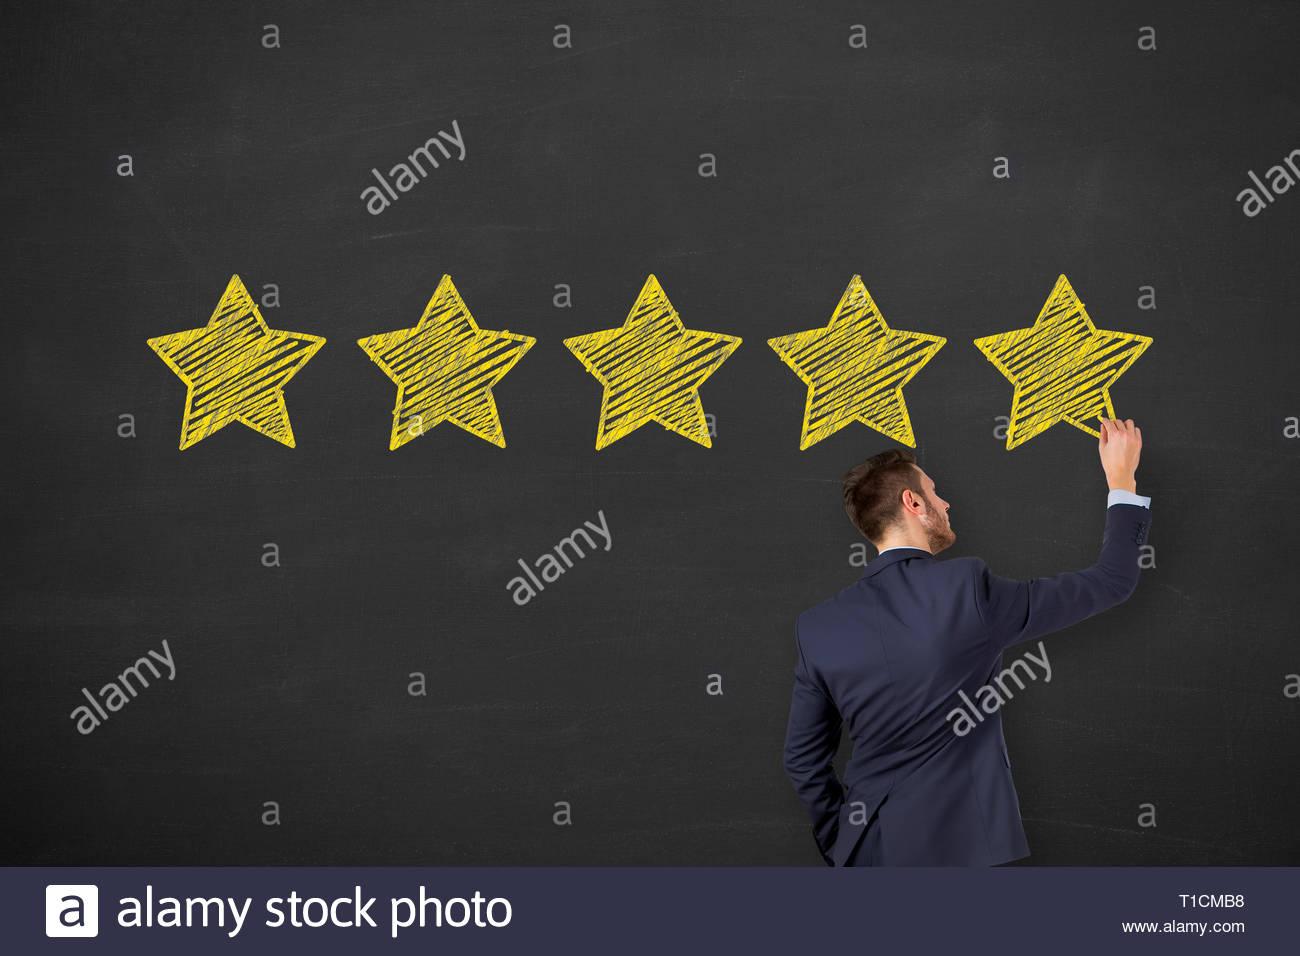 Customer Satisfaction Concepts on Chalkboard Background - Stock Image